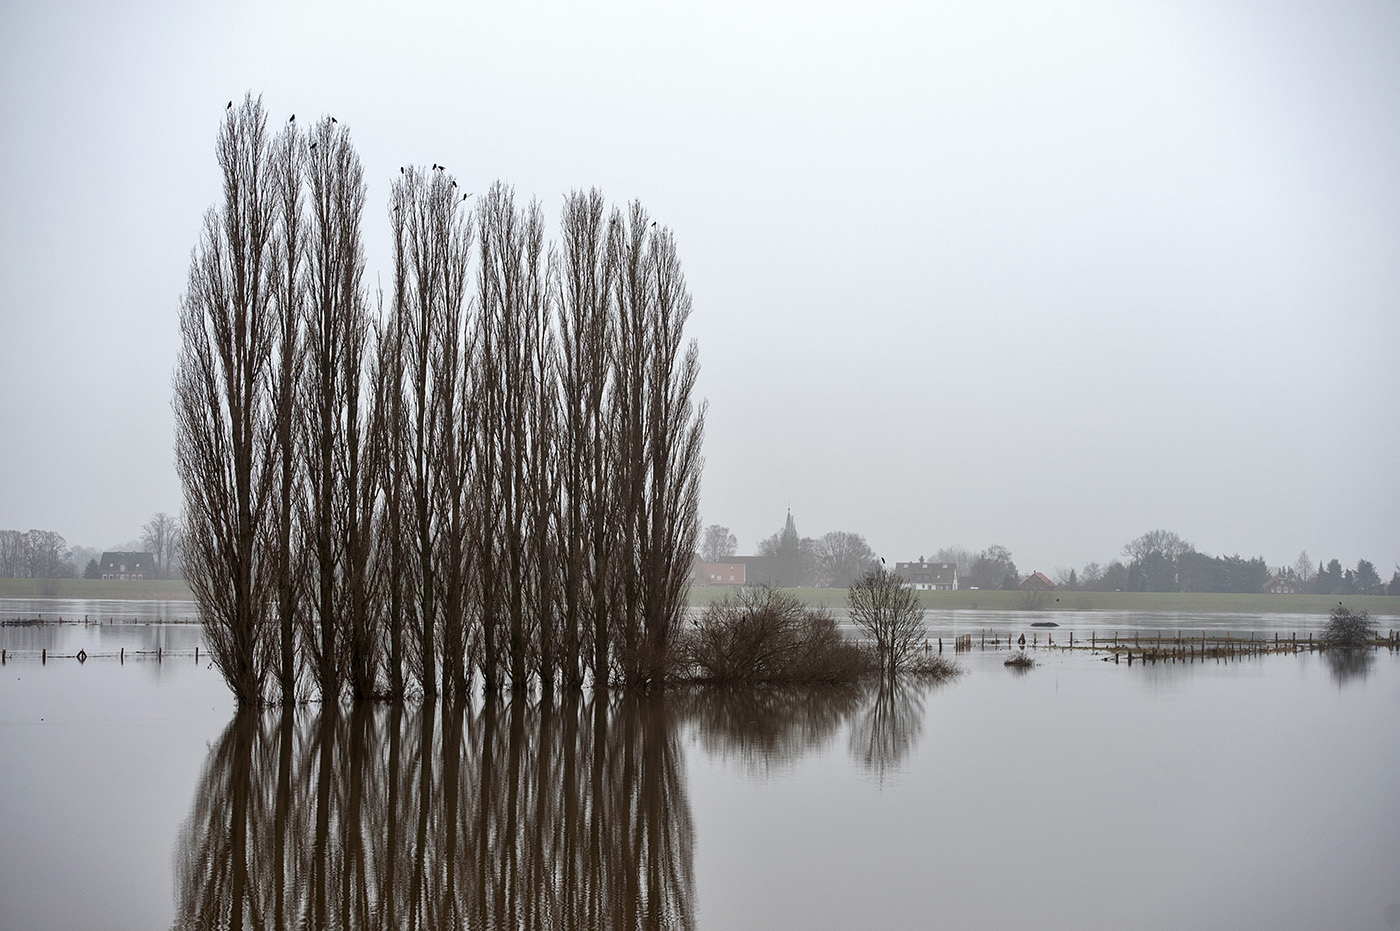 Flut, bei Zollenspieker Fährhaus